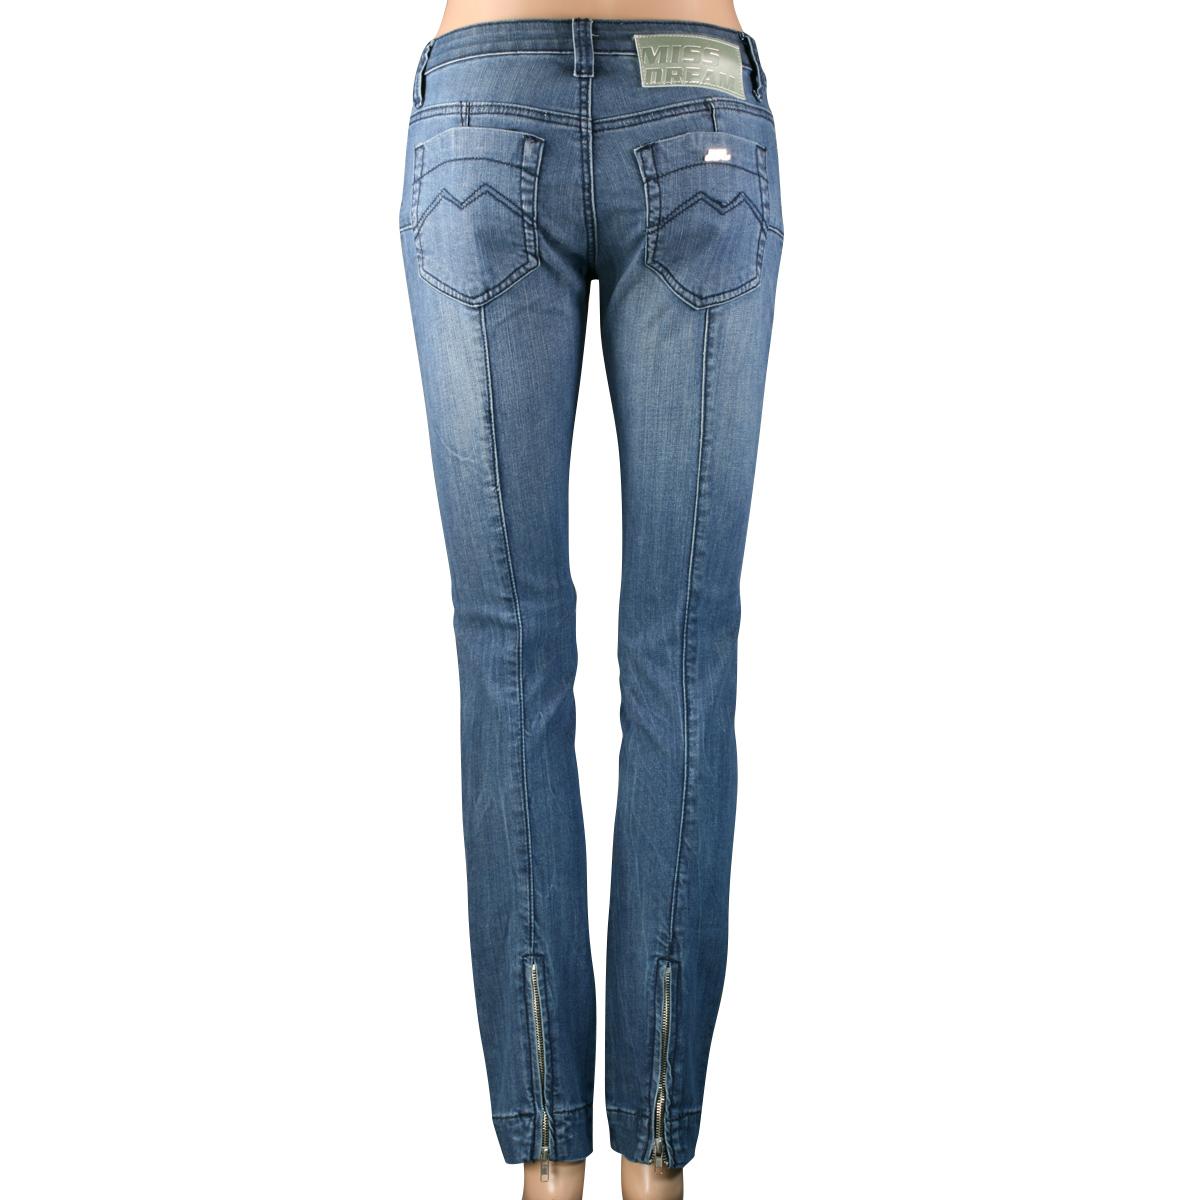 SHOEZY-womens-Slim-Fit-Skinny-Straight-Blue-Denim-pants-Stretch-Zip-Jeans-AU